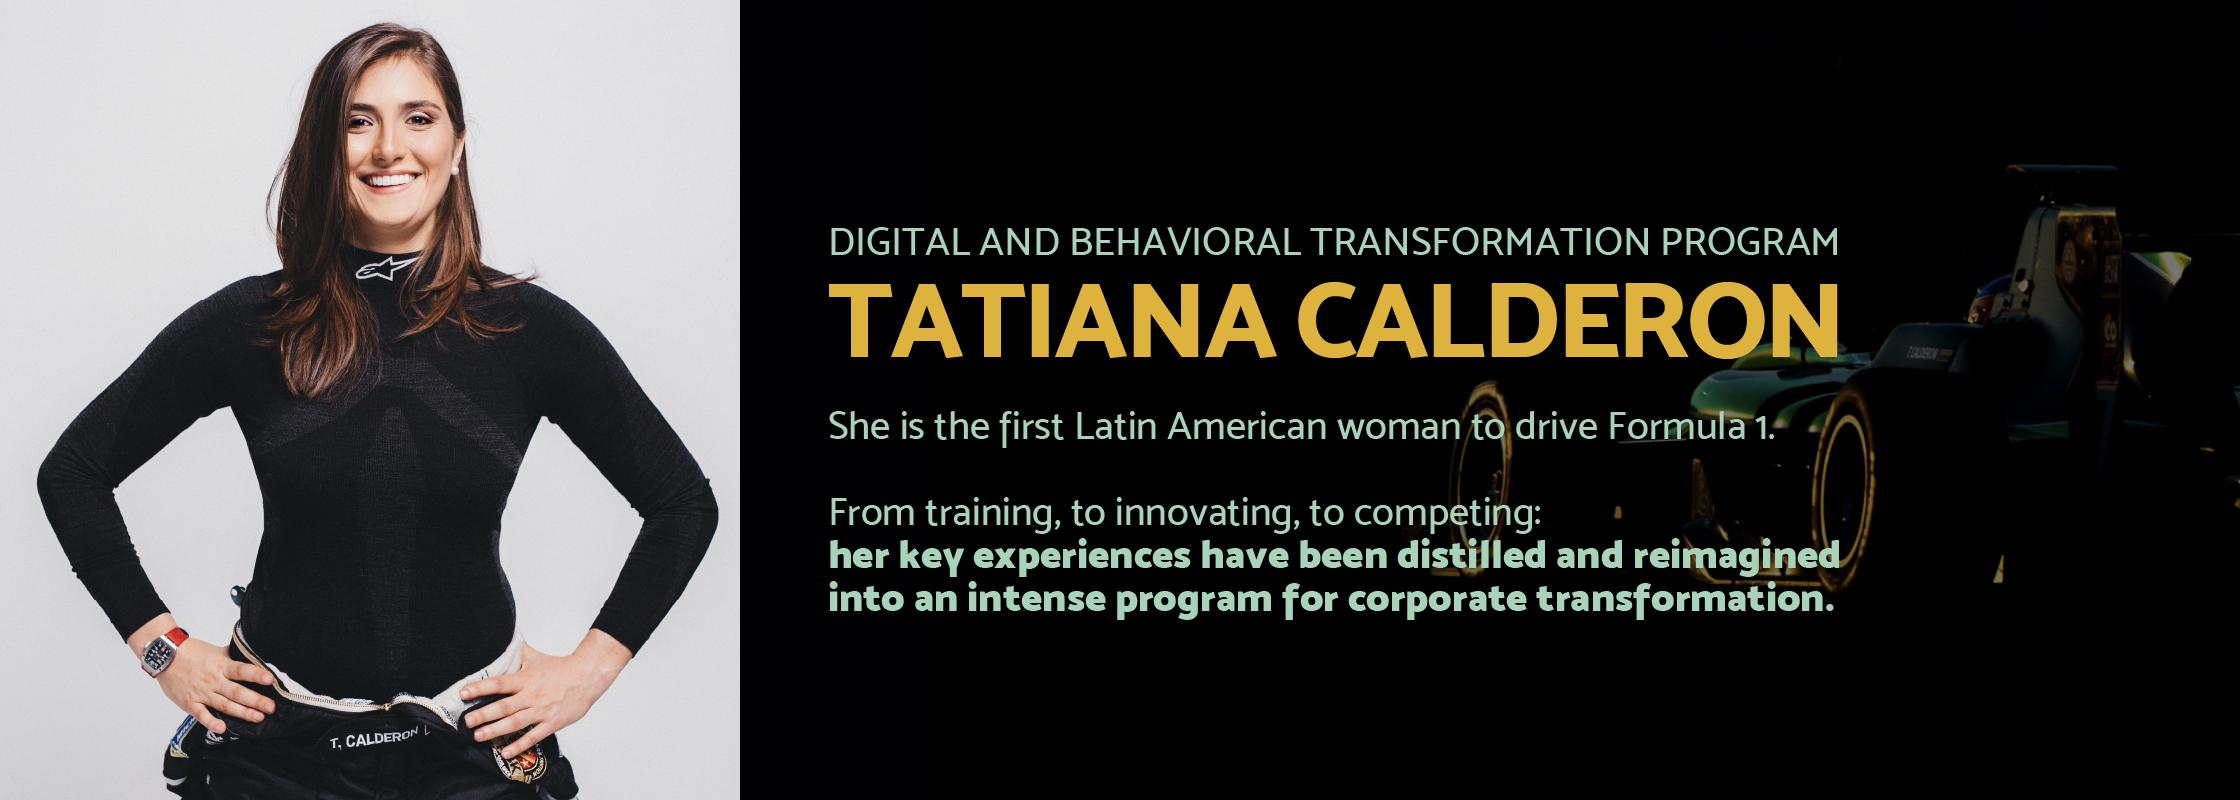 Tatiana Calderon Banner 1